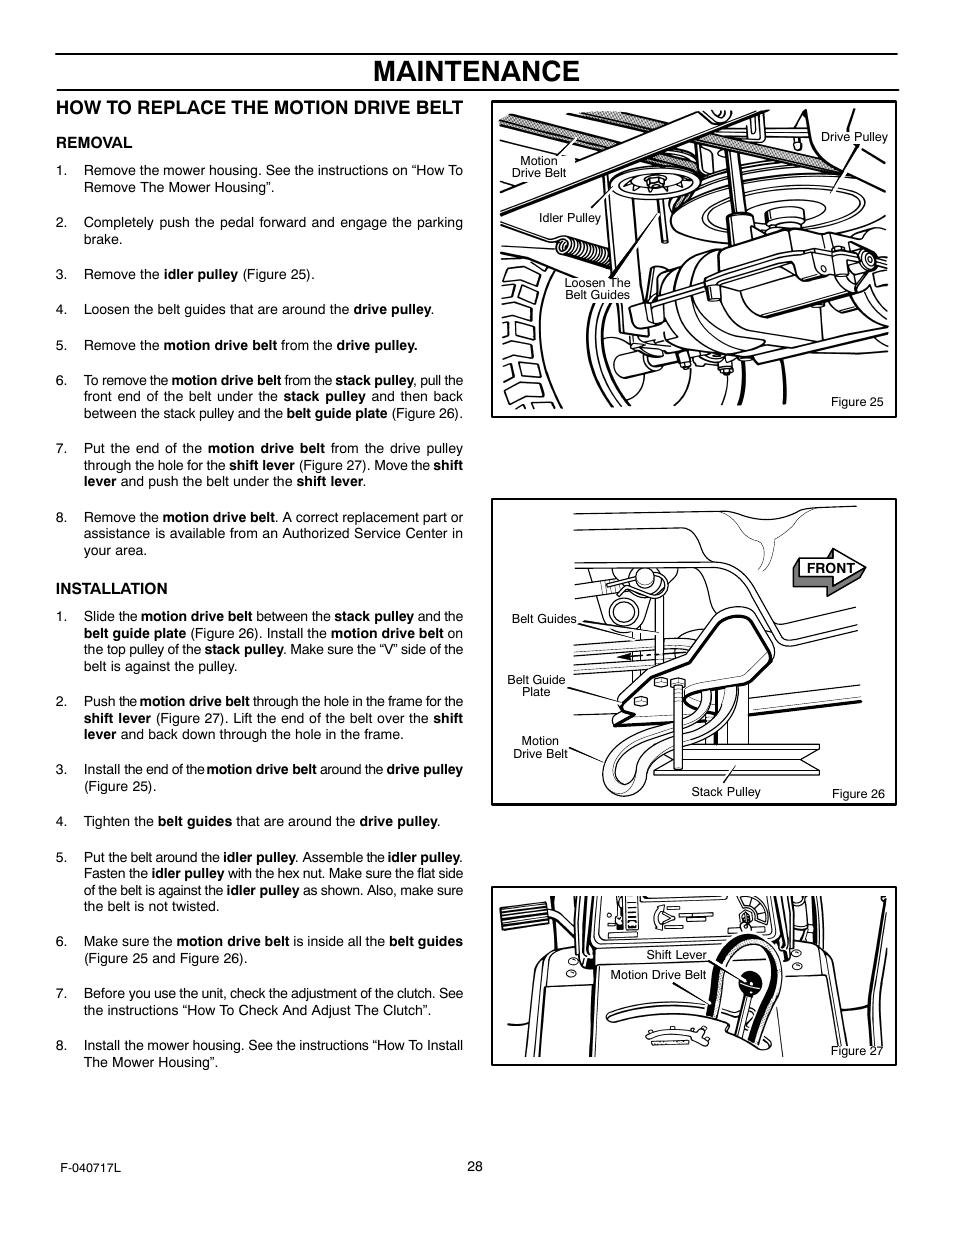 maintenance how to replace the motion drive belt murray rh manualsdir com murray snow blower user manual murray m2500 user manual